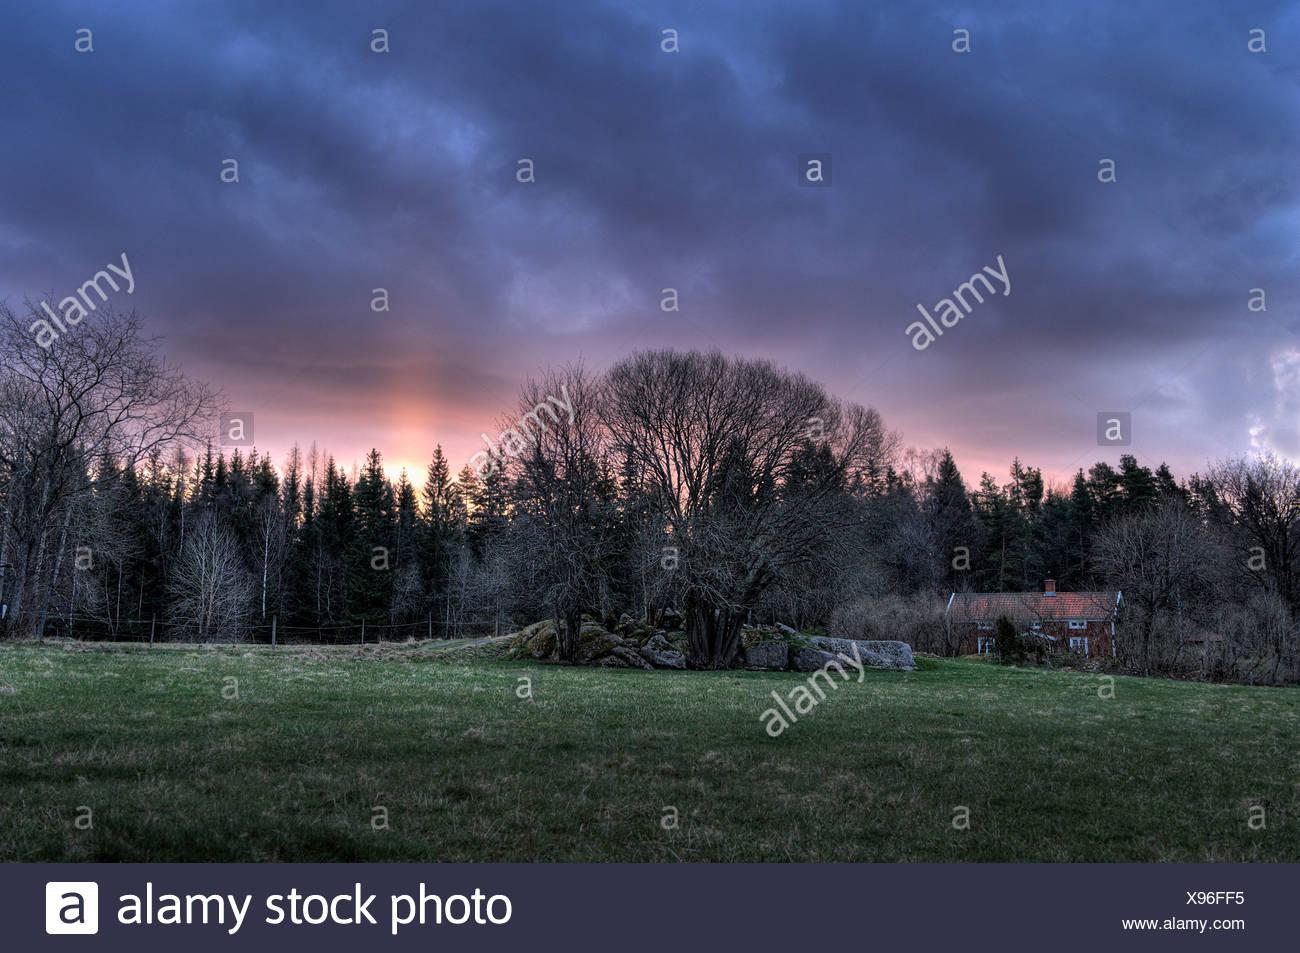 Bad weather above tree - Stock Image